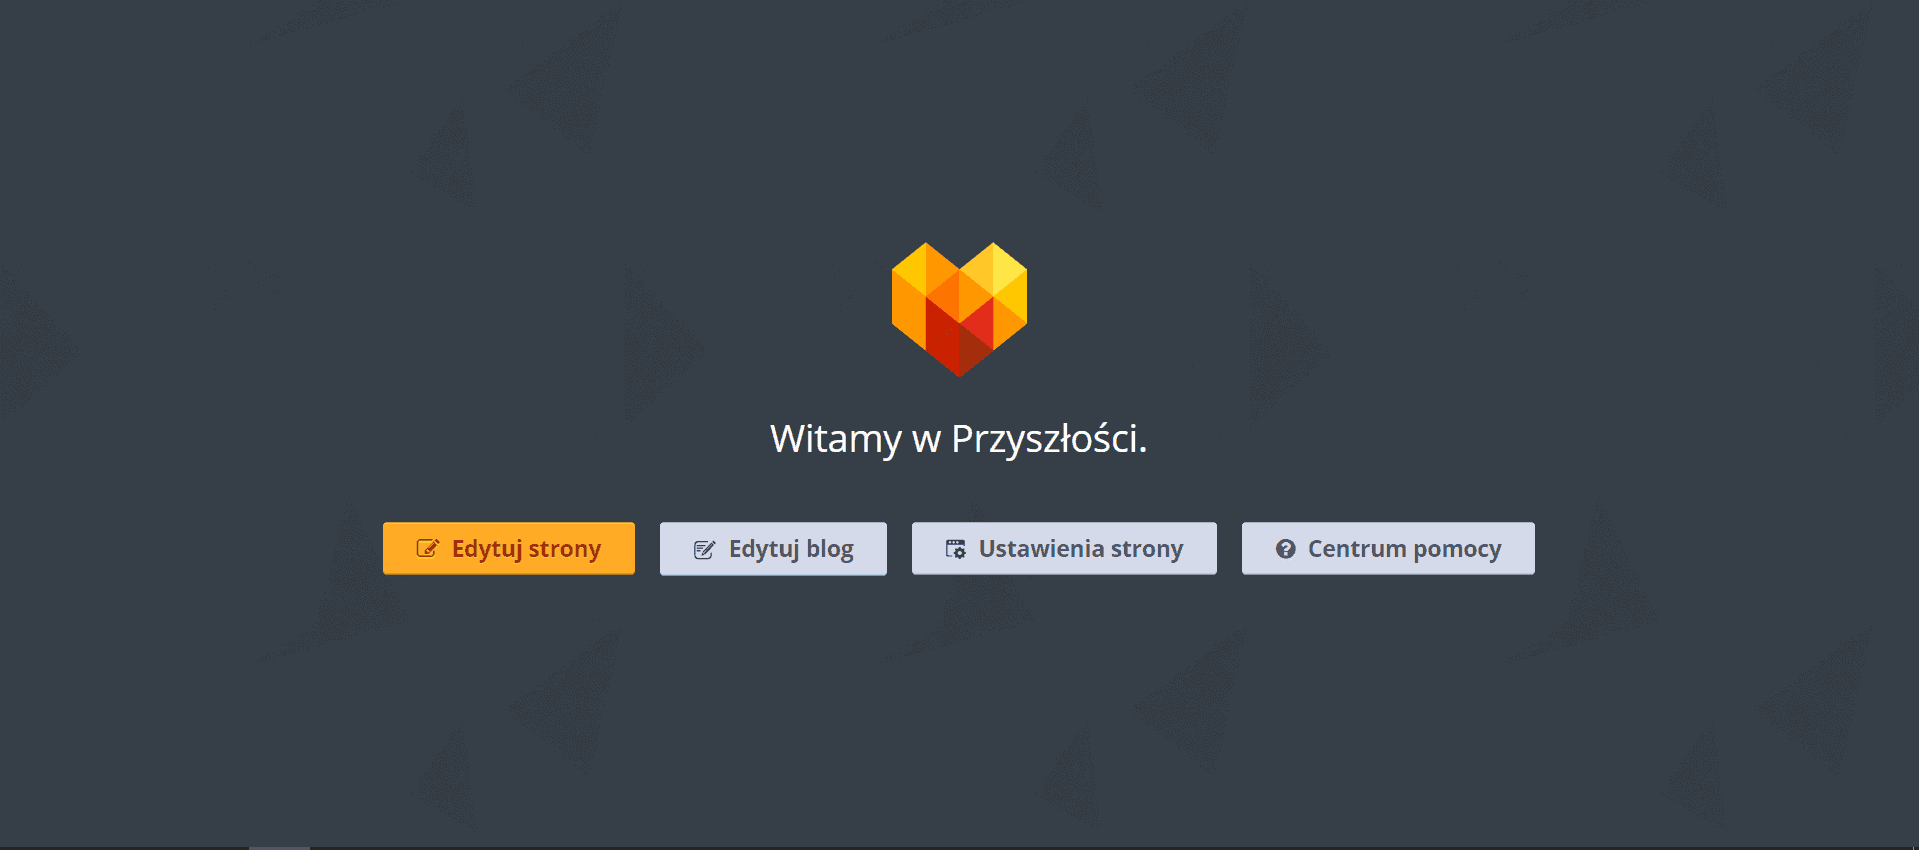 MotoCMS - konkurent WordPress? Recenzja MotoCMS3 imotywu odTemplateMonster